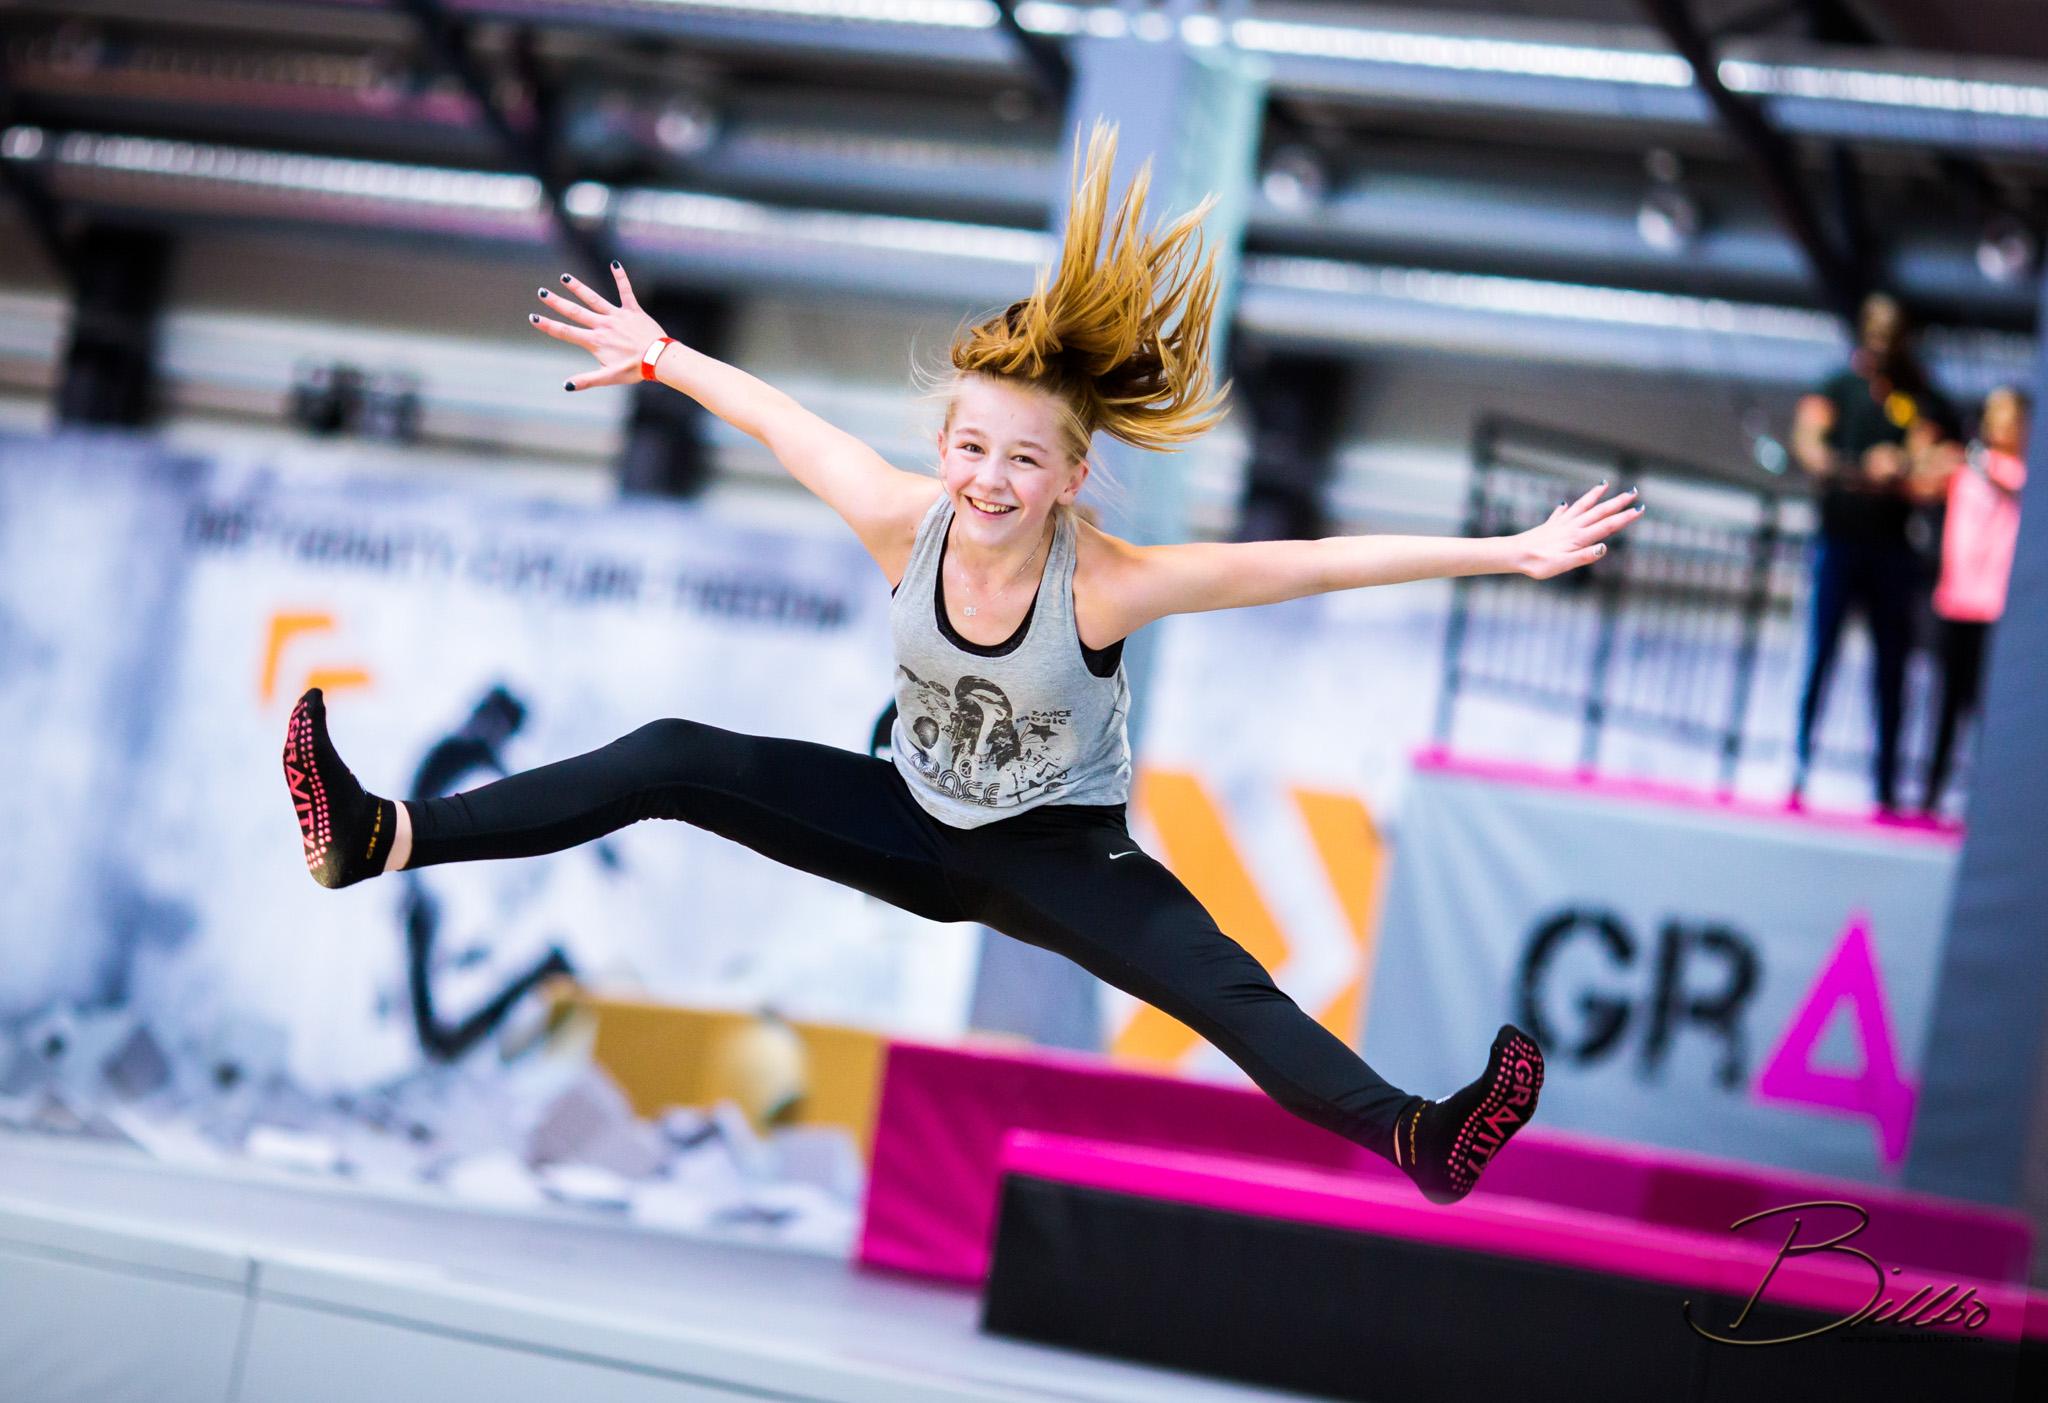 gravity sports larvik